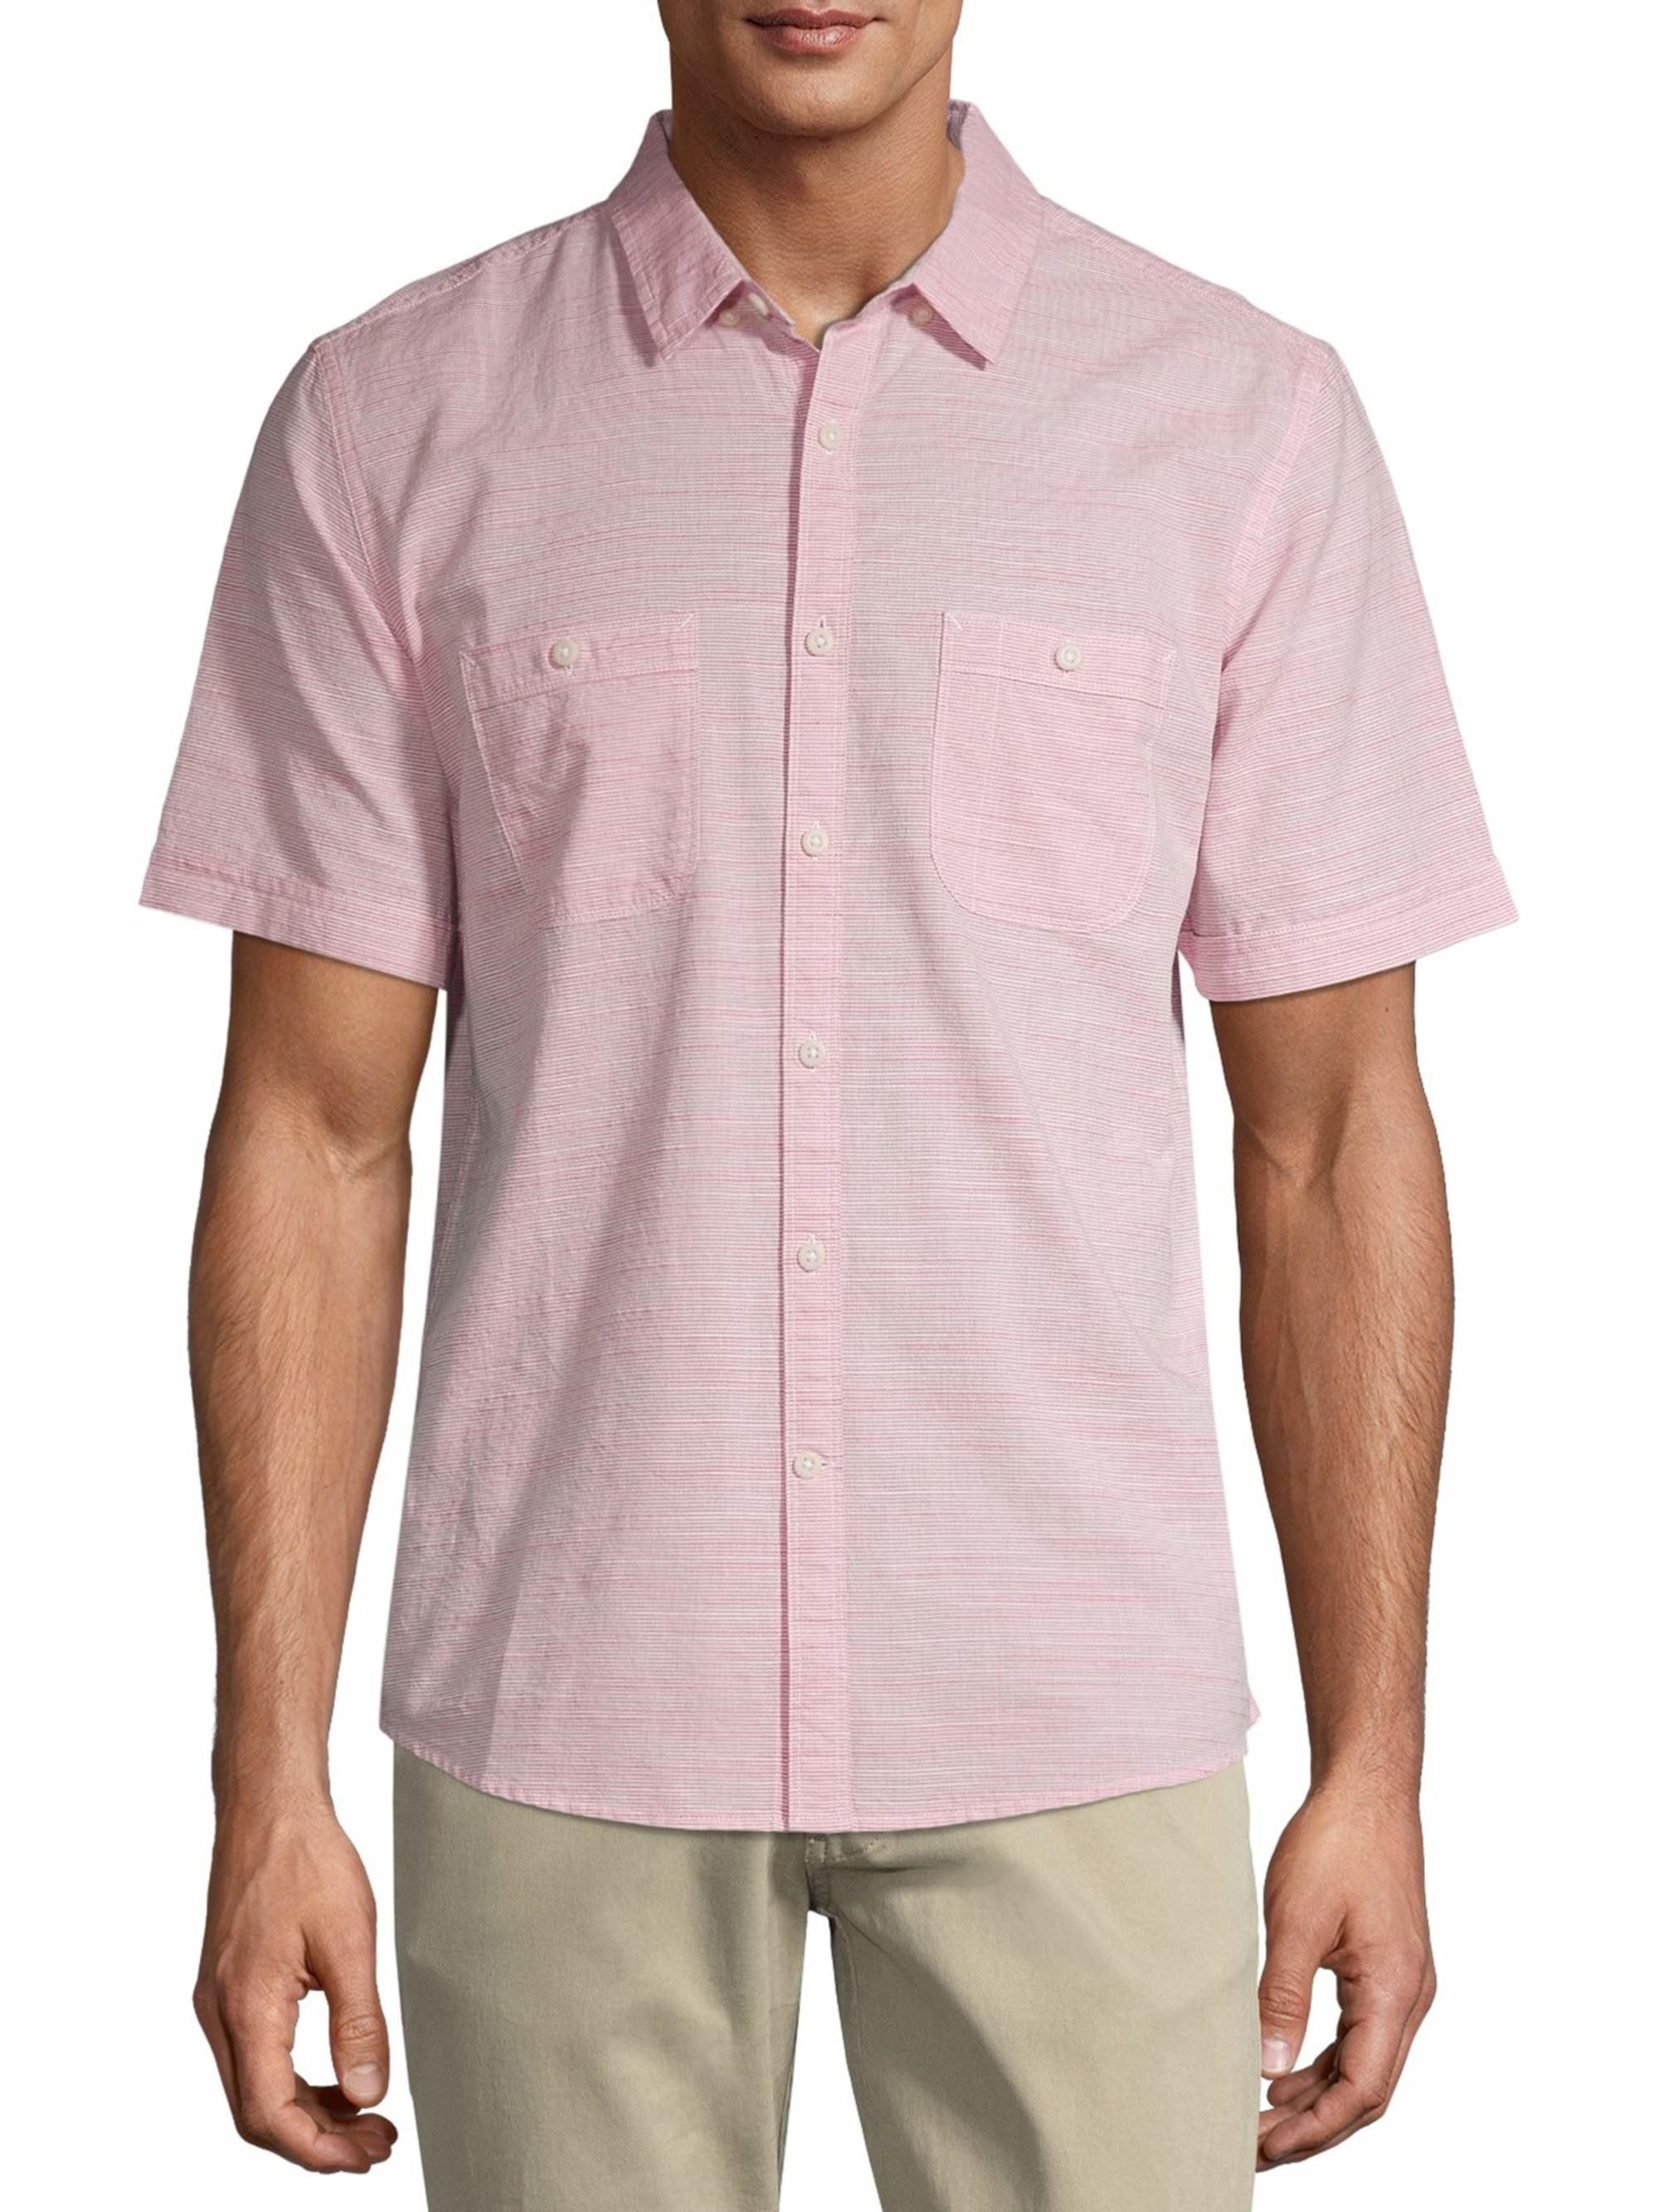 person wearing a pink short sleeve shirt and khaki pants